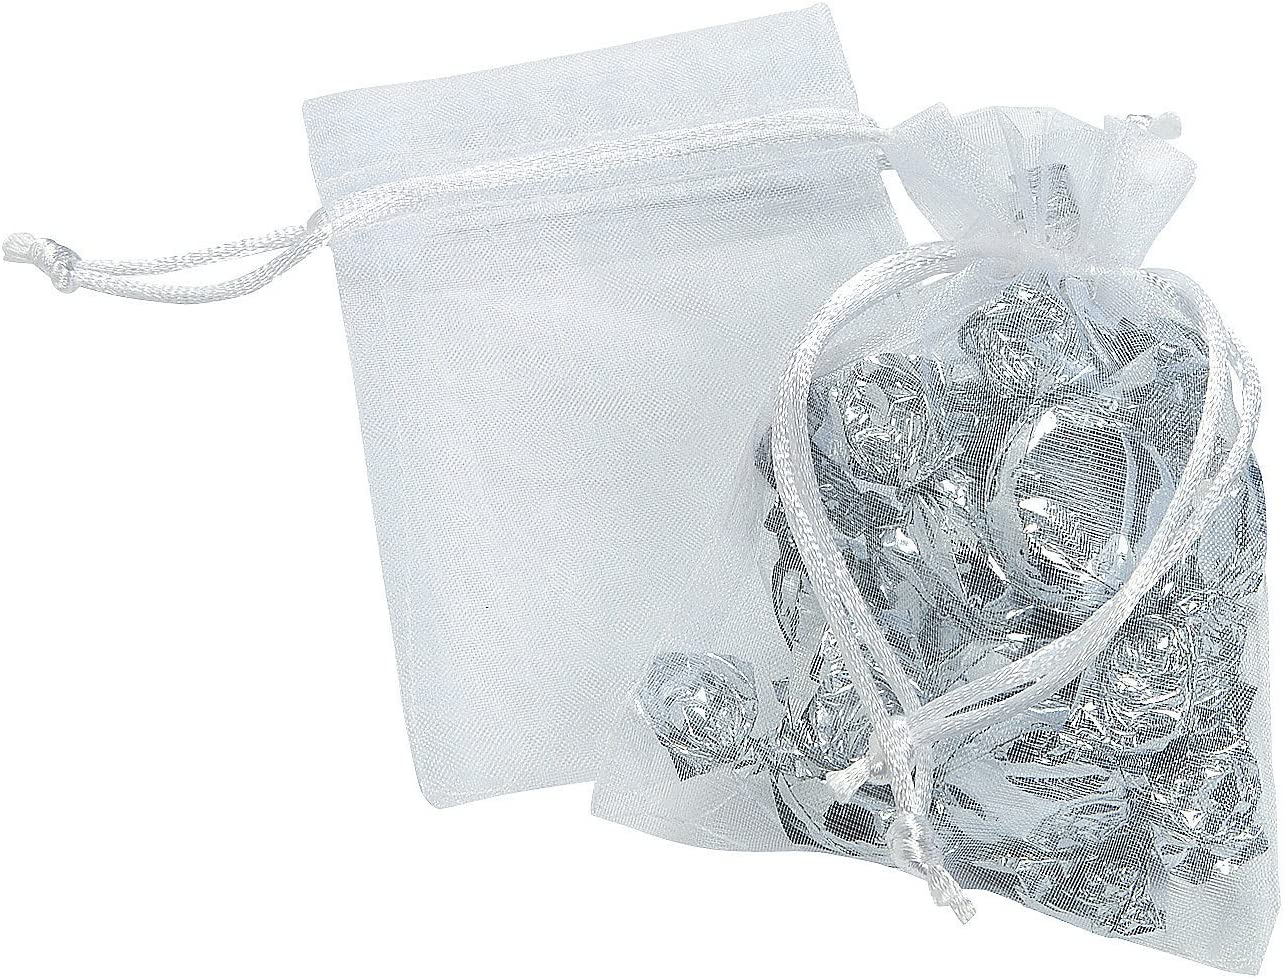 Party Supplies Small Sheer Organza Wedding Gift Bags for Wedding Fabric /& Textile Bags Wedding Bags 12 Pieces Fun Express